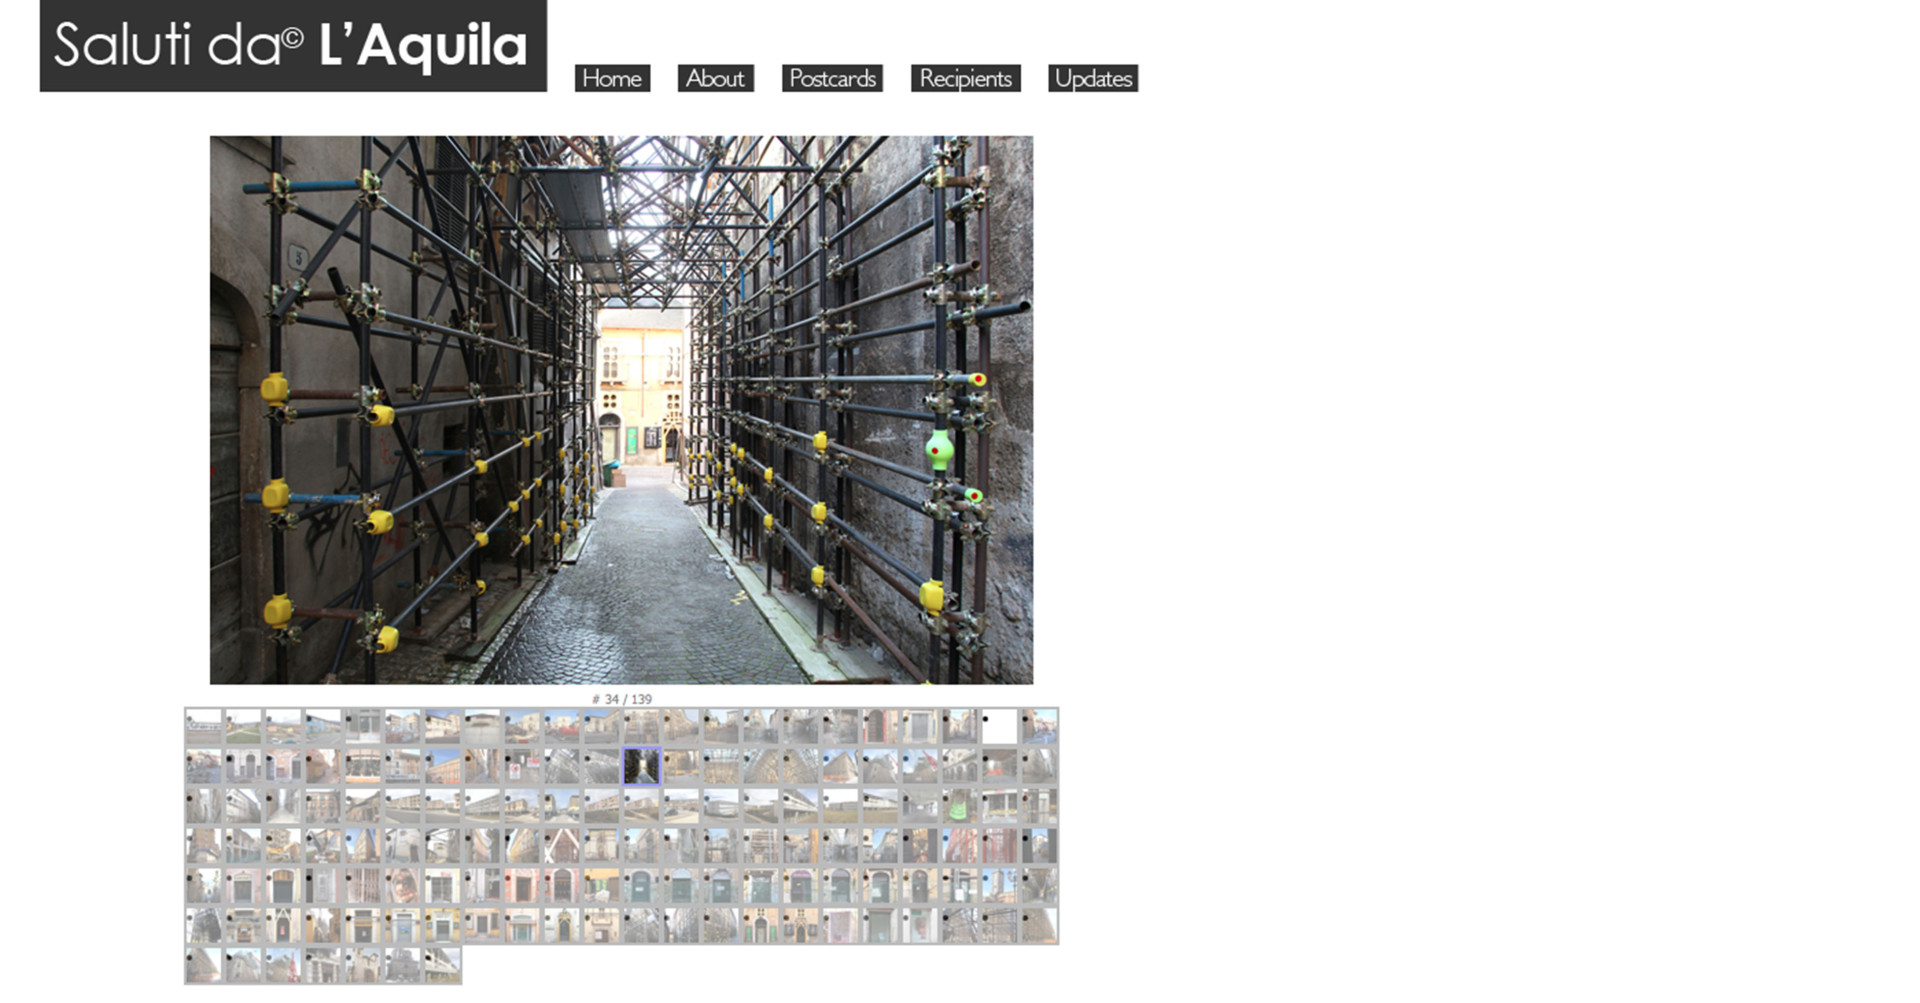 Saluti da L'Aquila schermata7_bassa